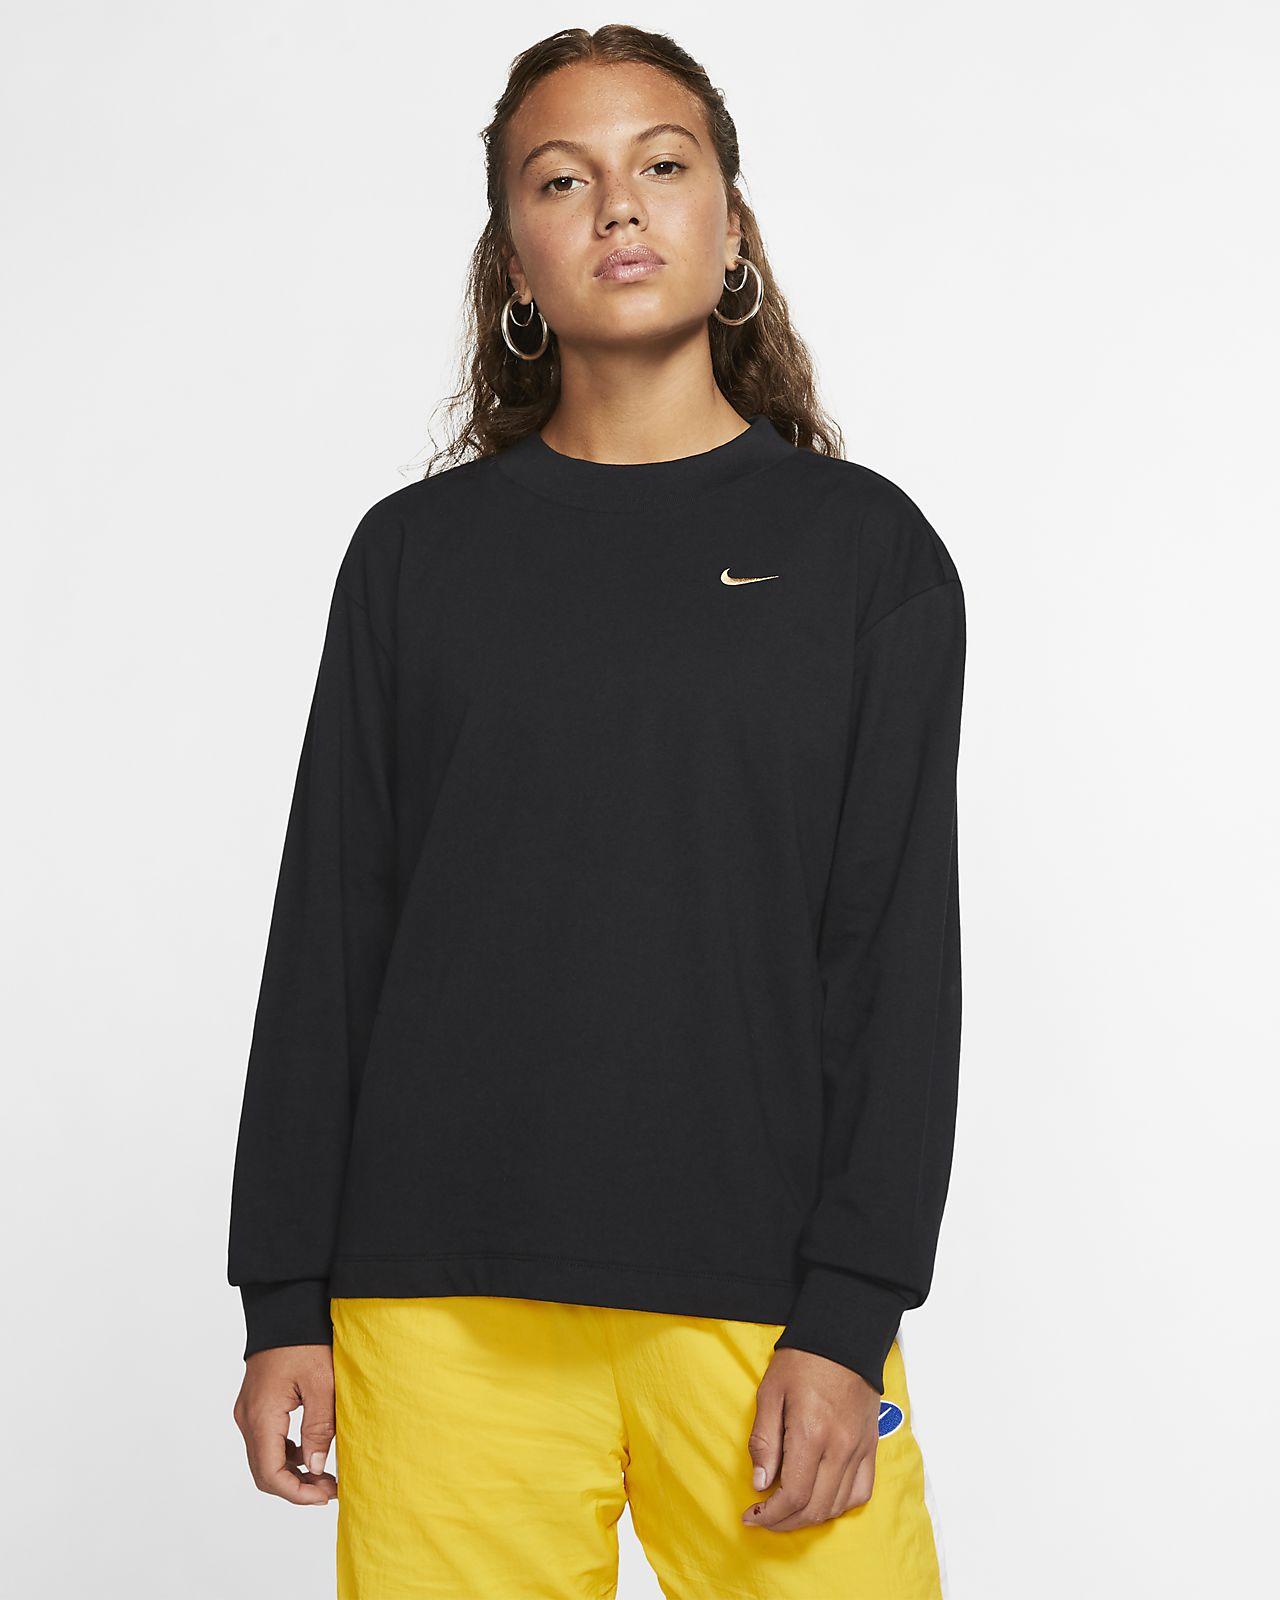 Shirts & Tops | Nike Damen AIR CROP BlackWhite — Eremea